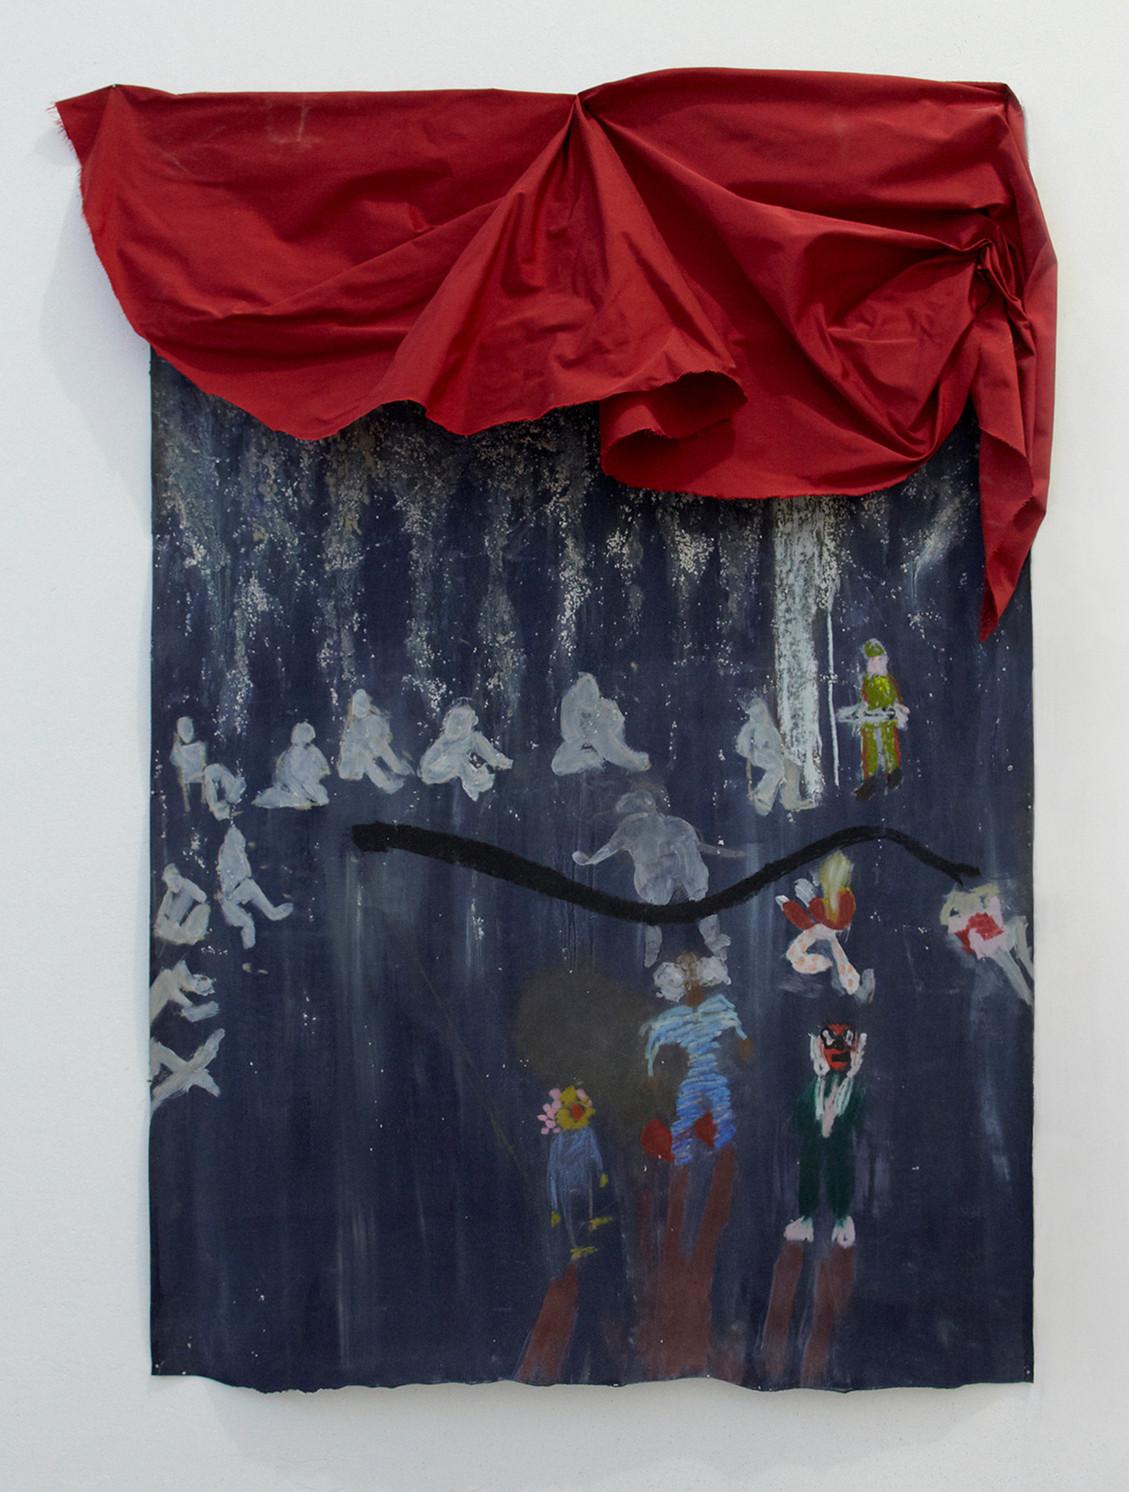 Stage, Stage, 2018  | Oil pastel on neoprene | 90 x 60 cm